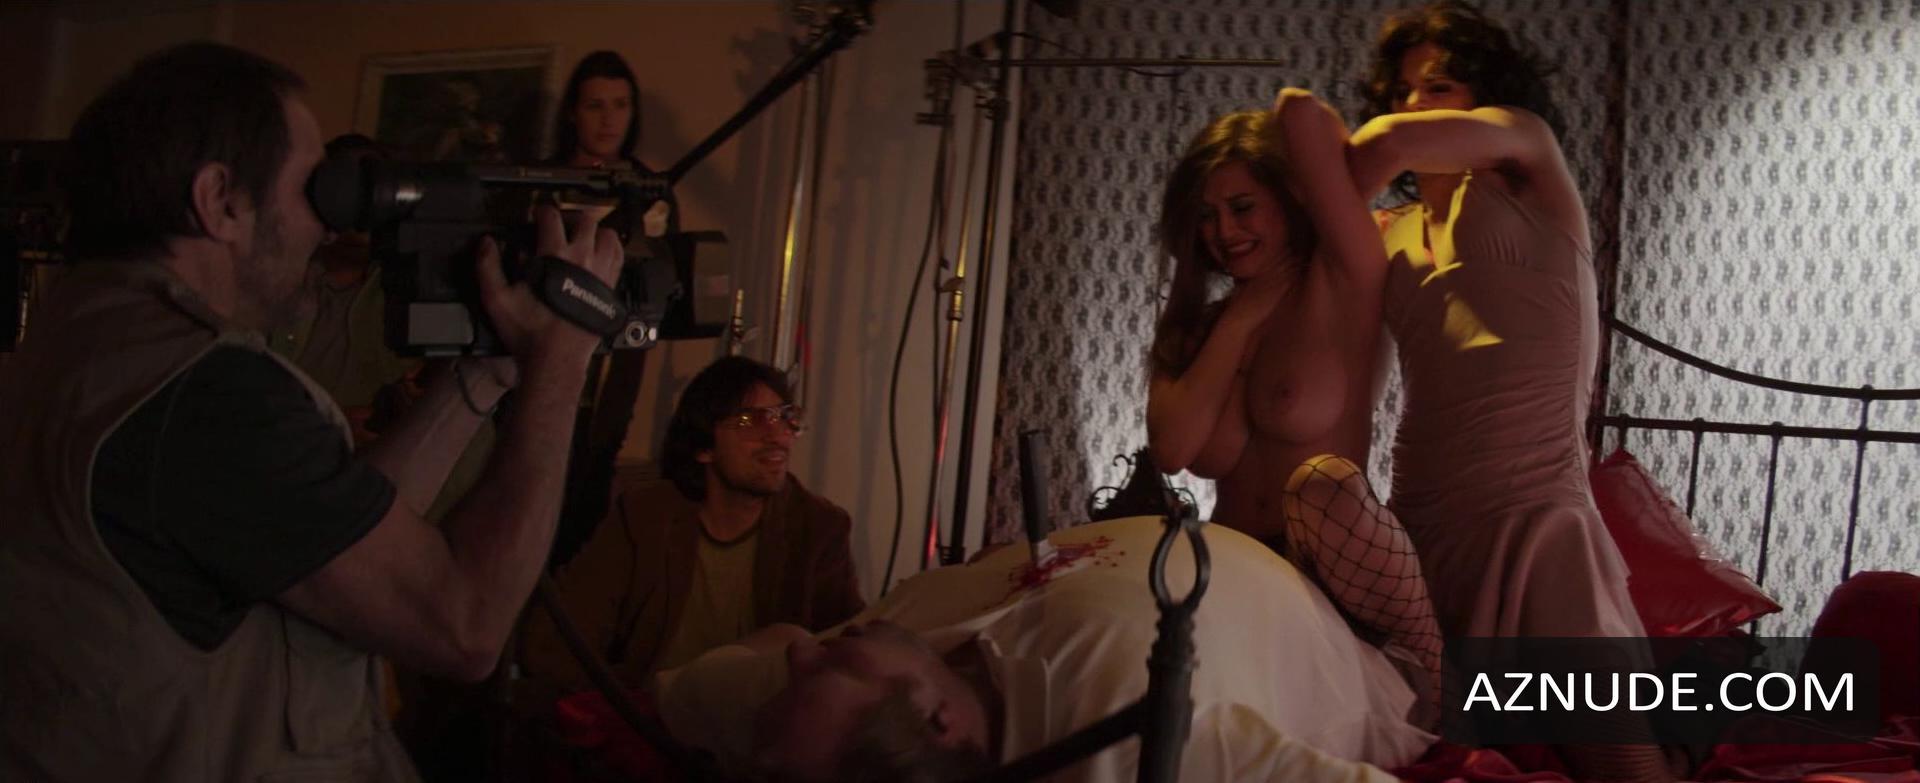 funny naked girl pics